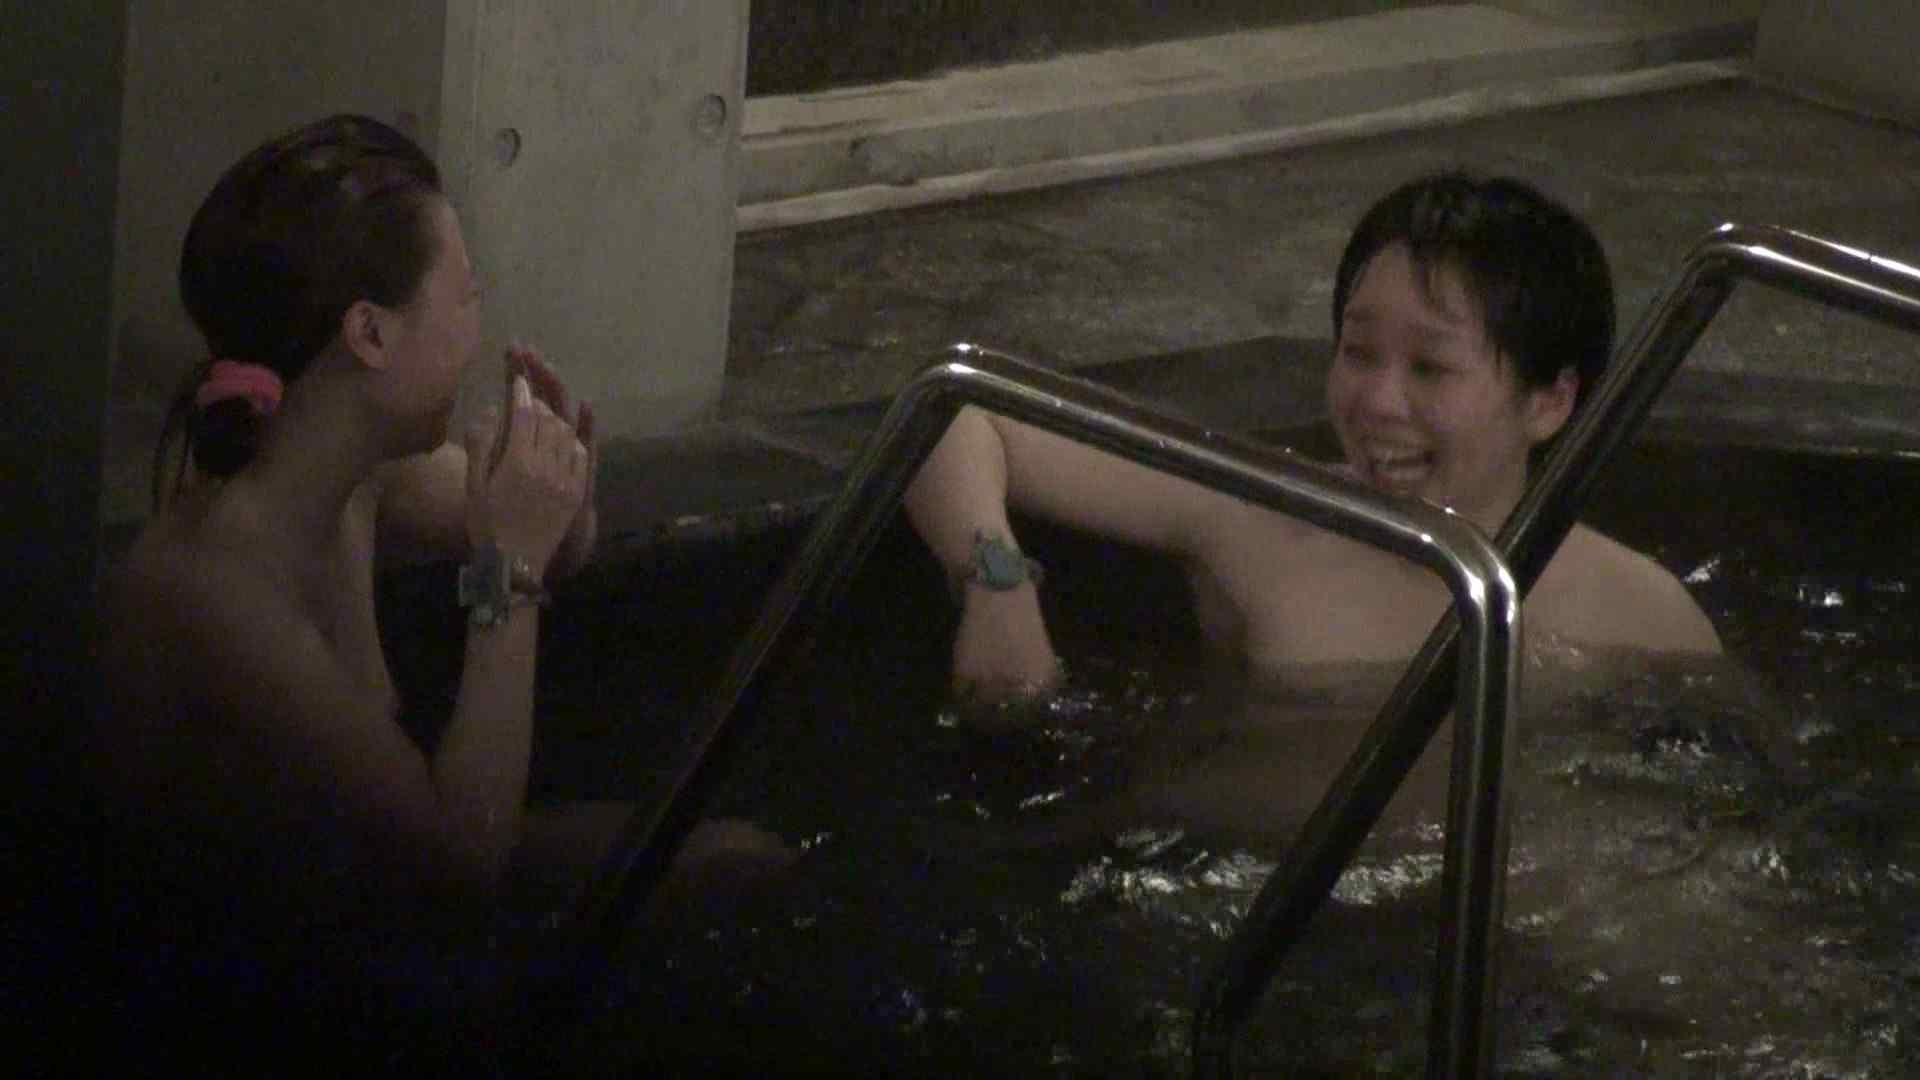 Aquaな露天風呂Vol.394 盗撮師作品  70pic 48